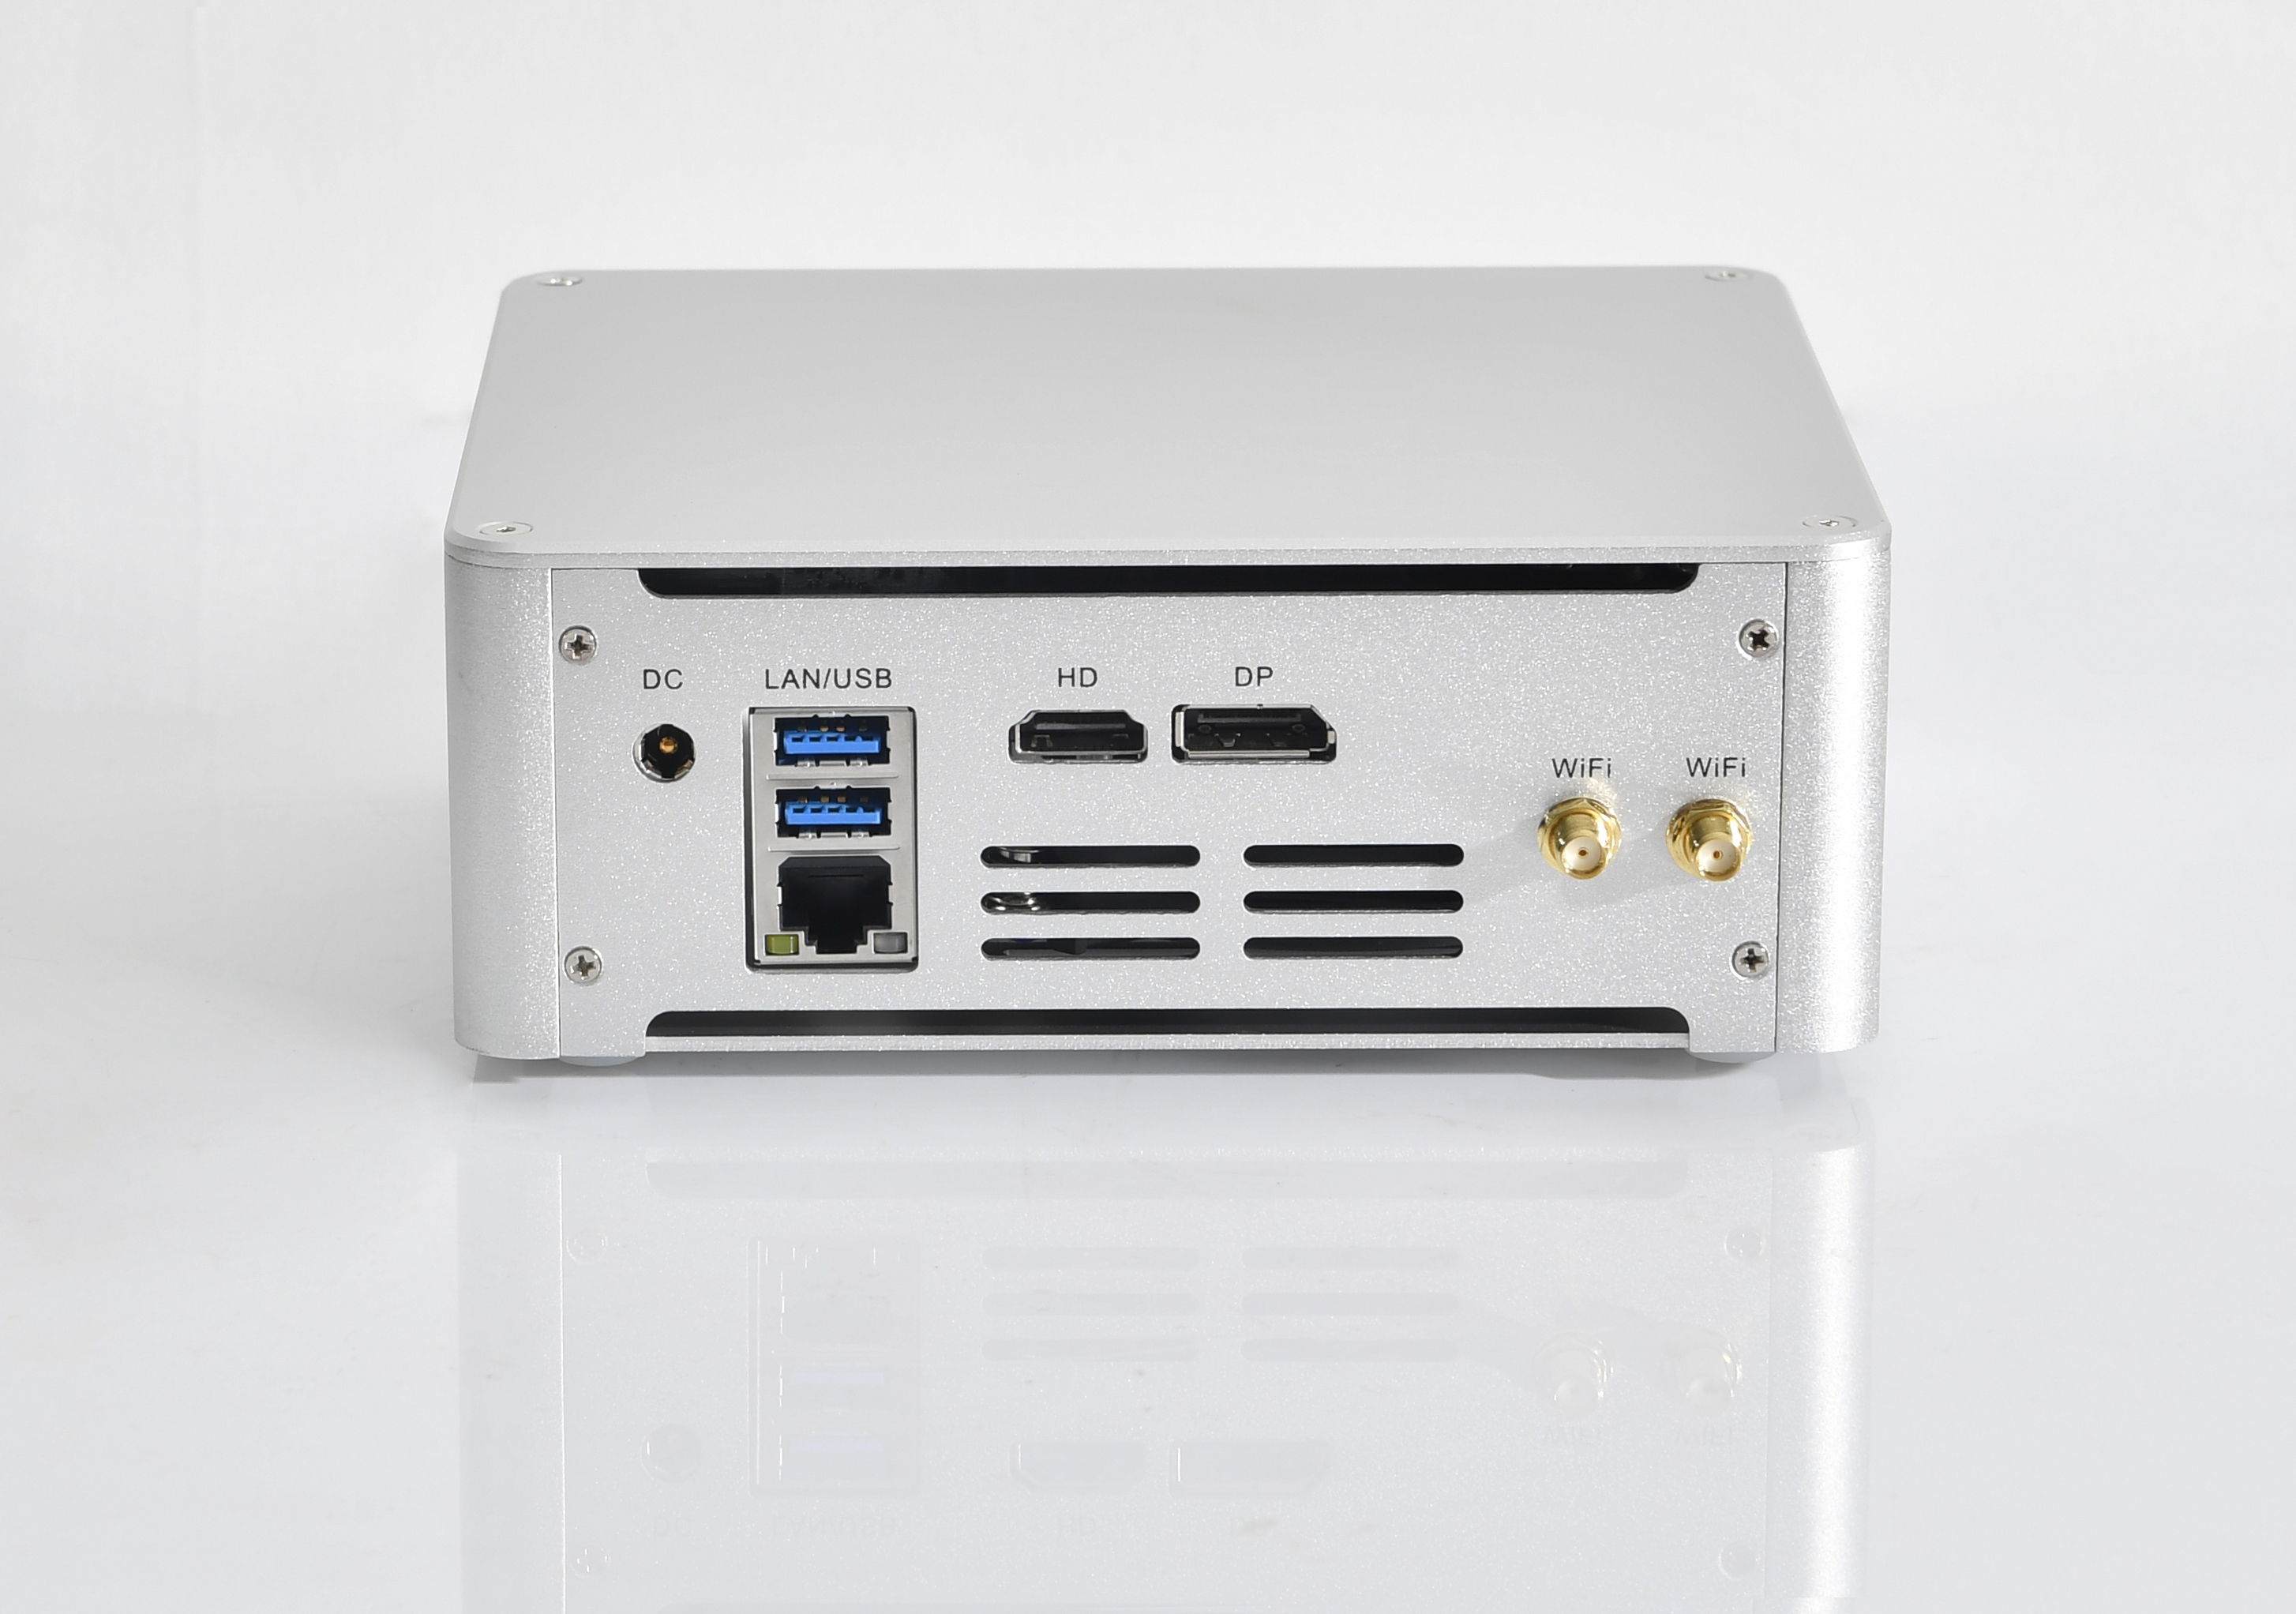 Kingdel Mini PC Intel HD Graphics630 Quad Core 8Mb Cache I7 7820HK I5 7300HQ Nettop Mini PC Computer